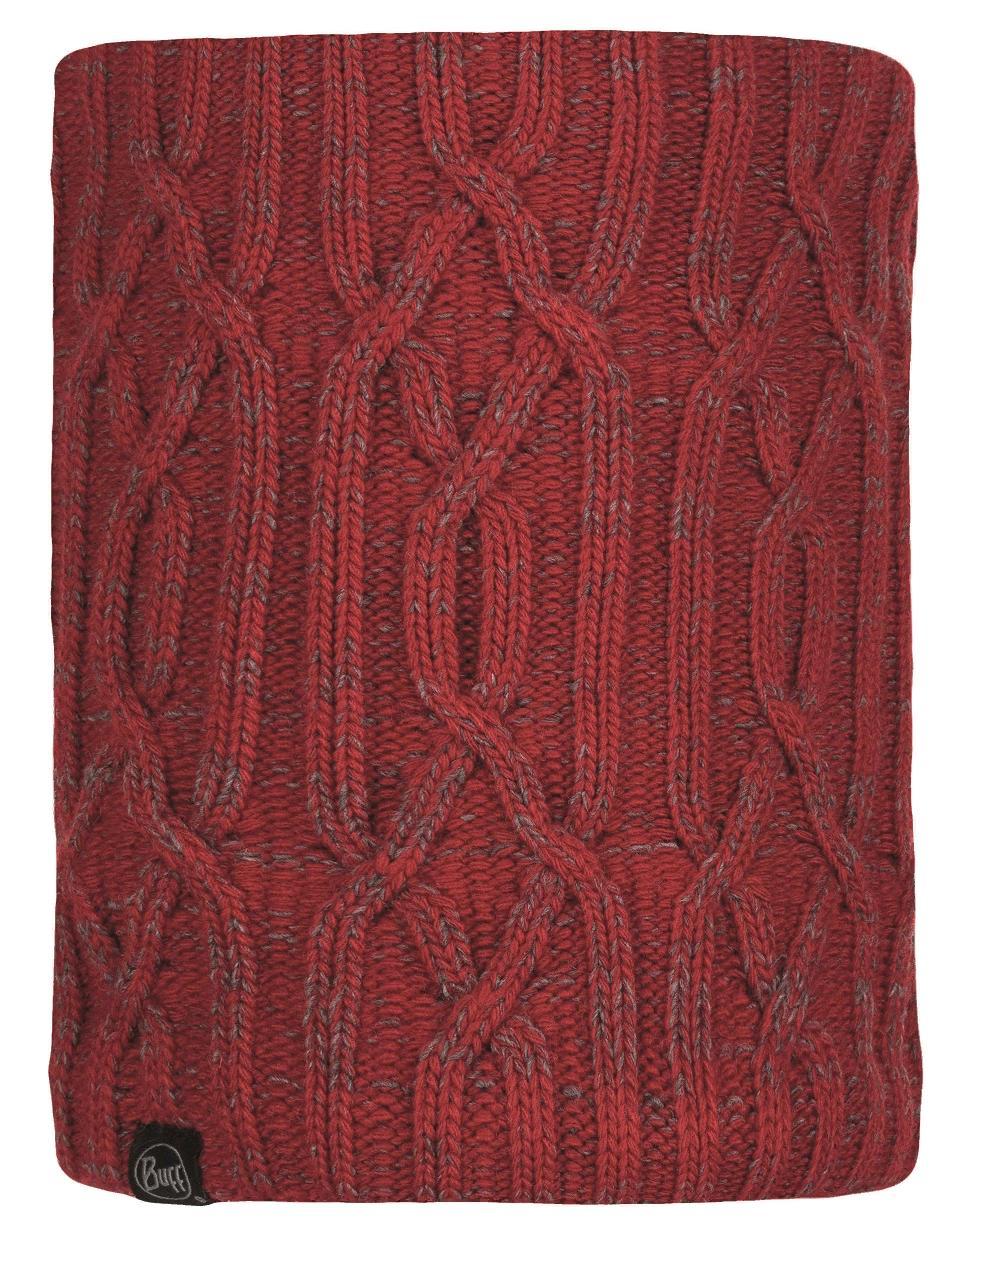 Шарф Buff Knitted & Polar Neckwarmer Idun Red